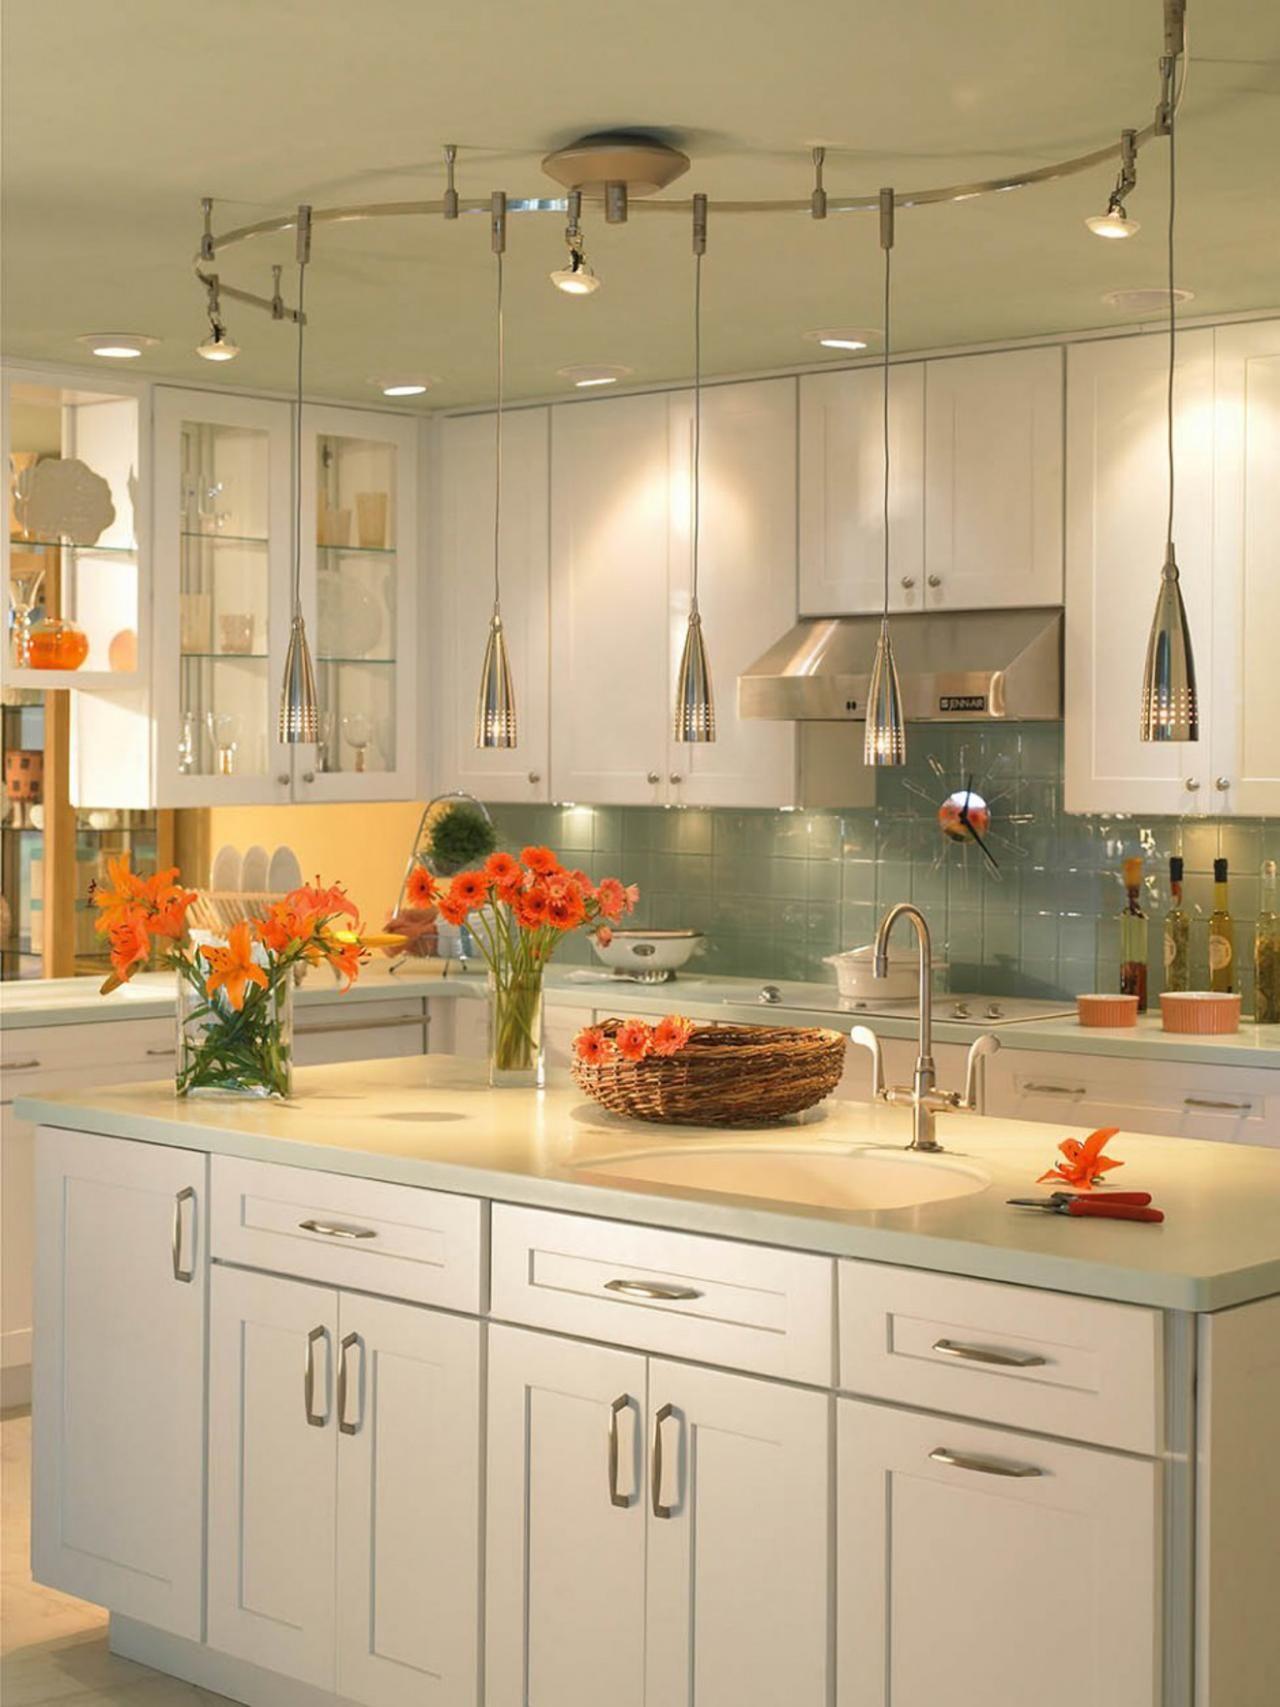 Kitchen Lighting Design Tips Kitchen Design Small Small Kitchen Lighting Best Kitchen Lighting